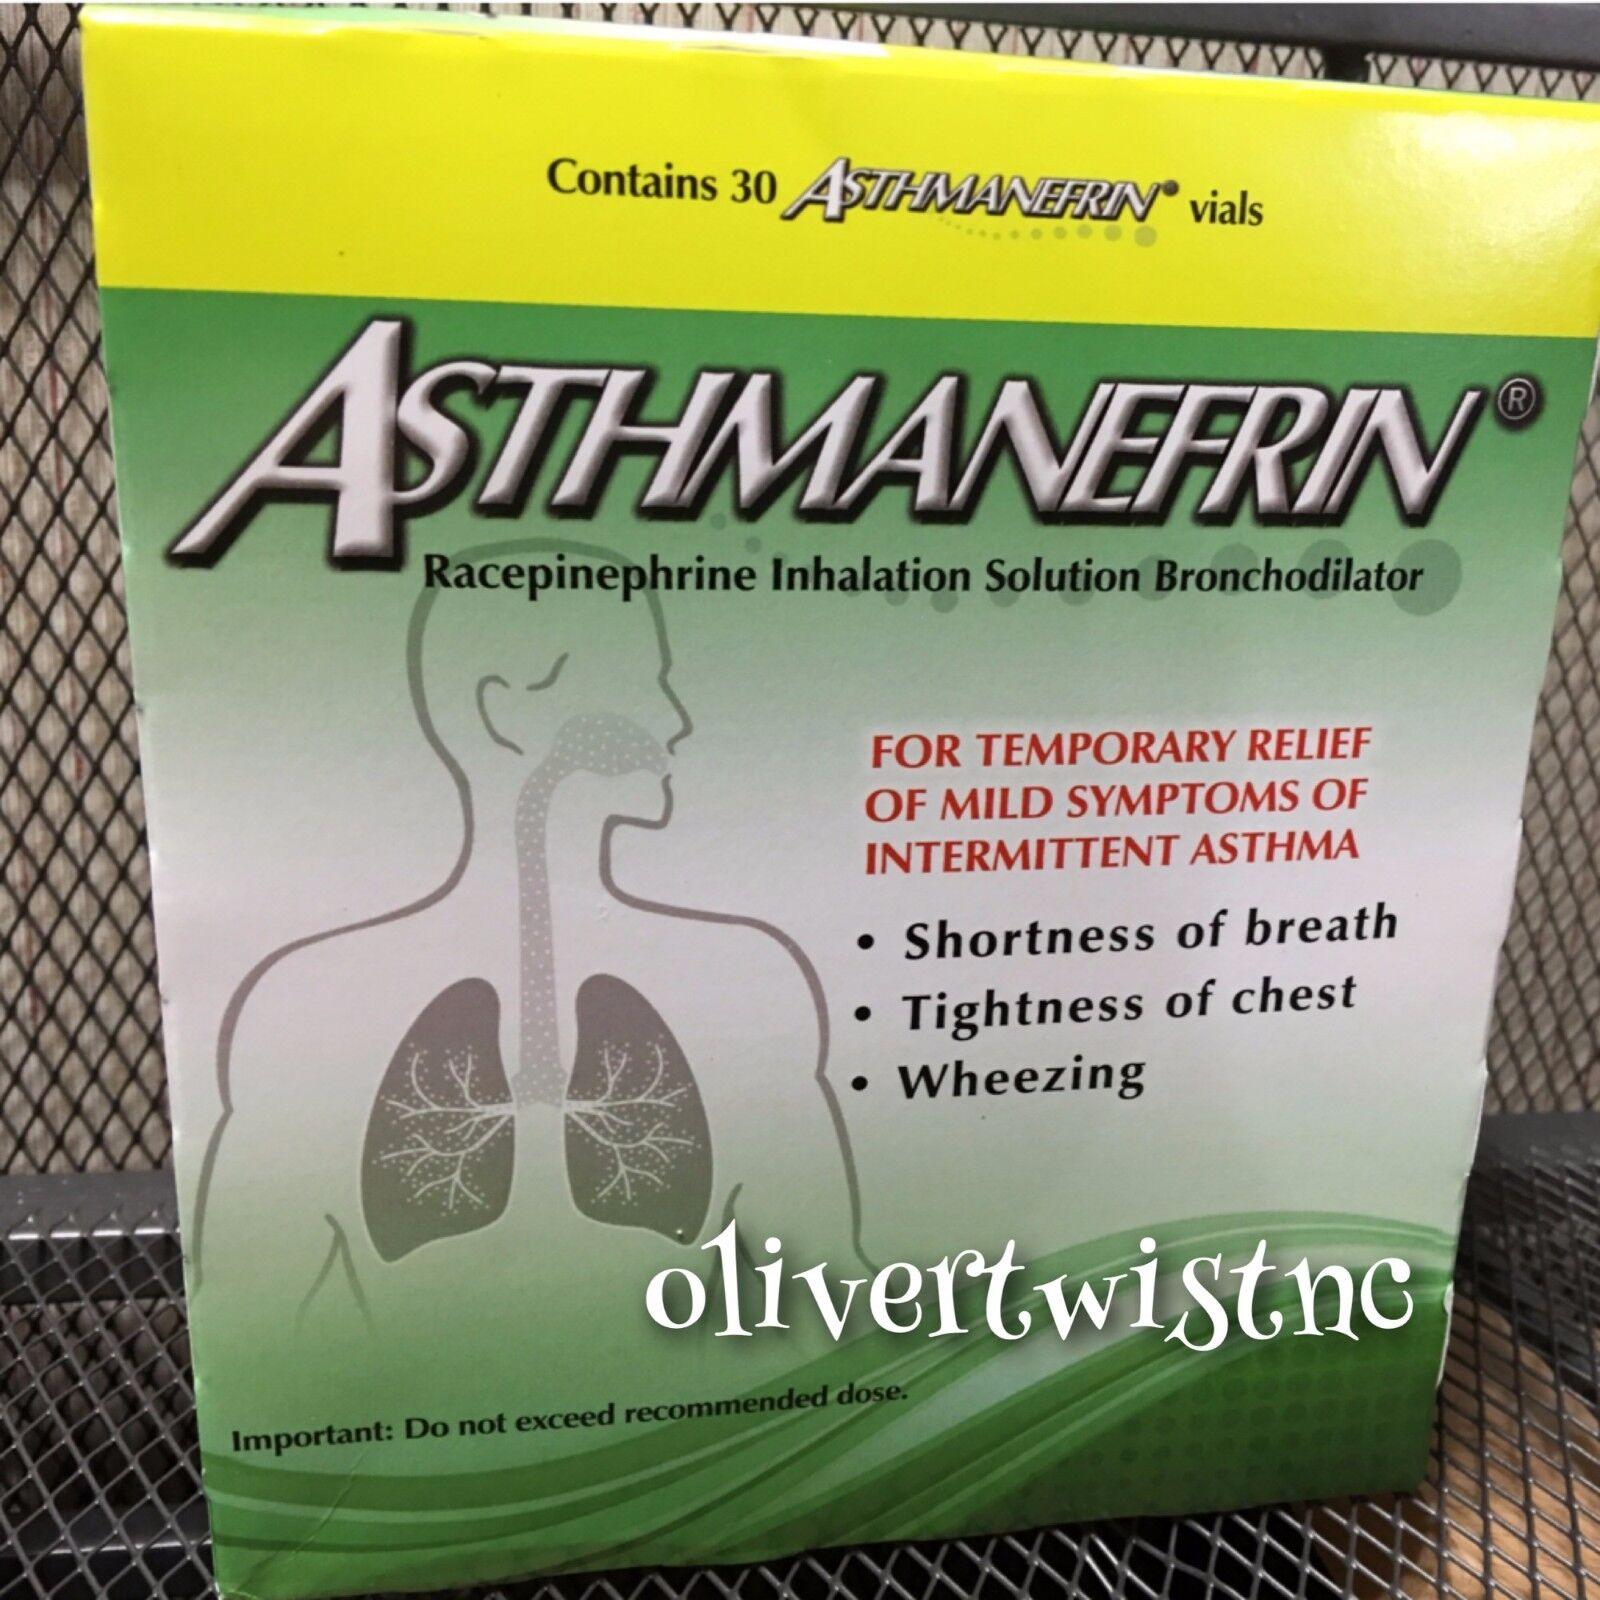 Asthmanefrin Asthma Inhaler Refill 30 Vials Factory Seale...